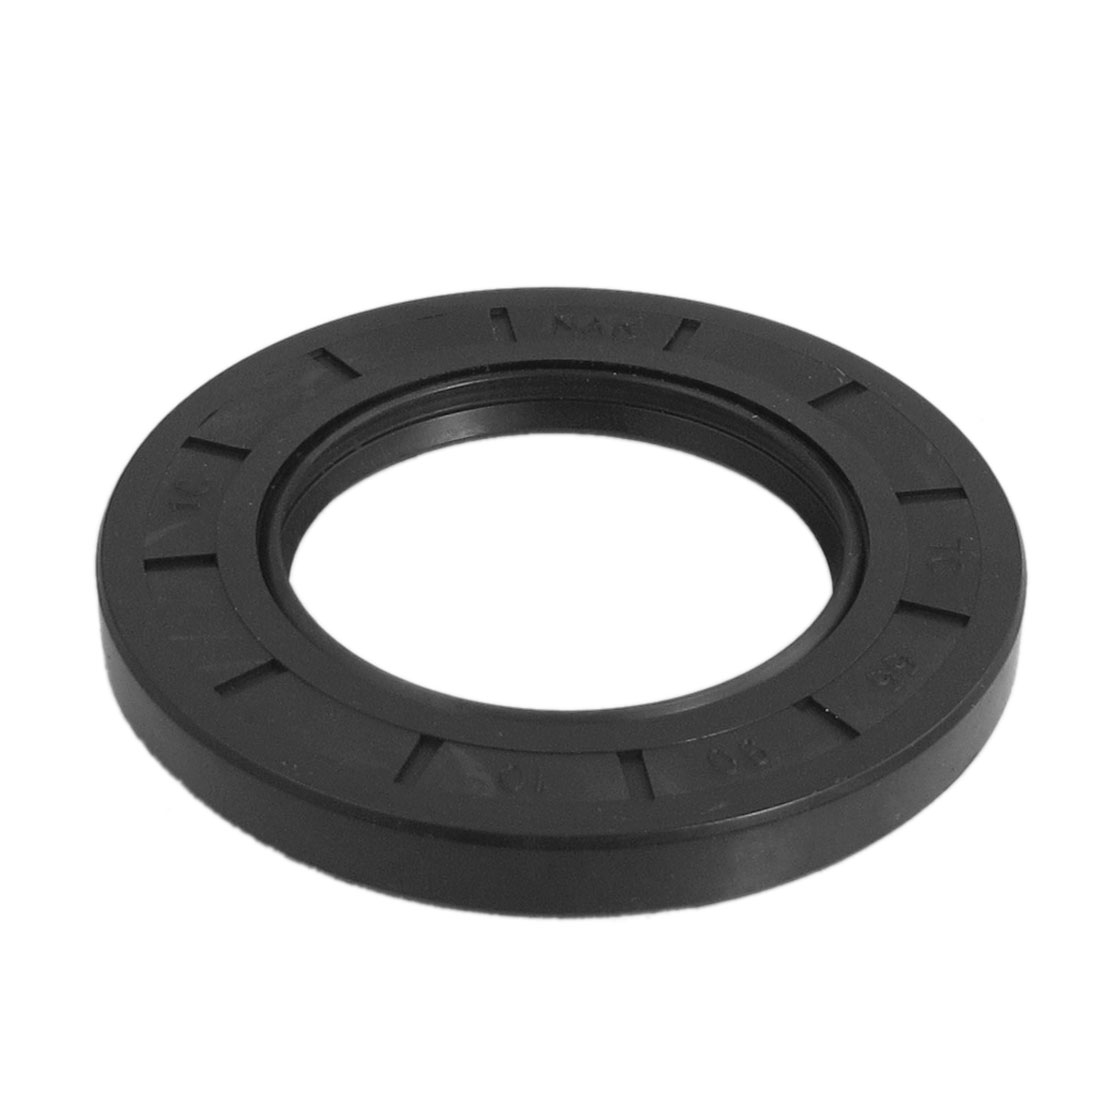 Black Nitrile Rubber Dual Lips Oil Shaft Seal TC 55mm x 90mm x 10mm